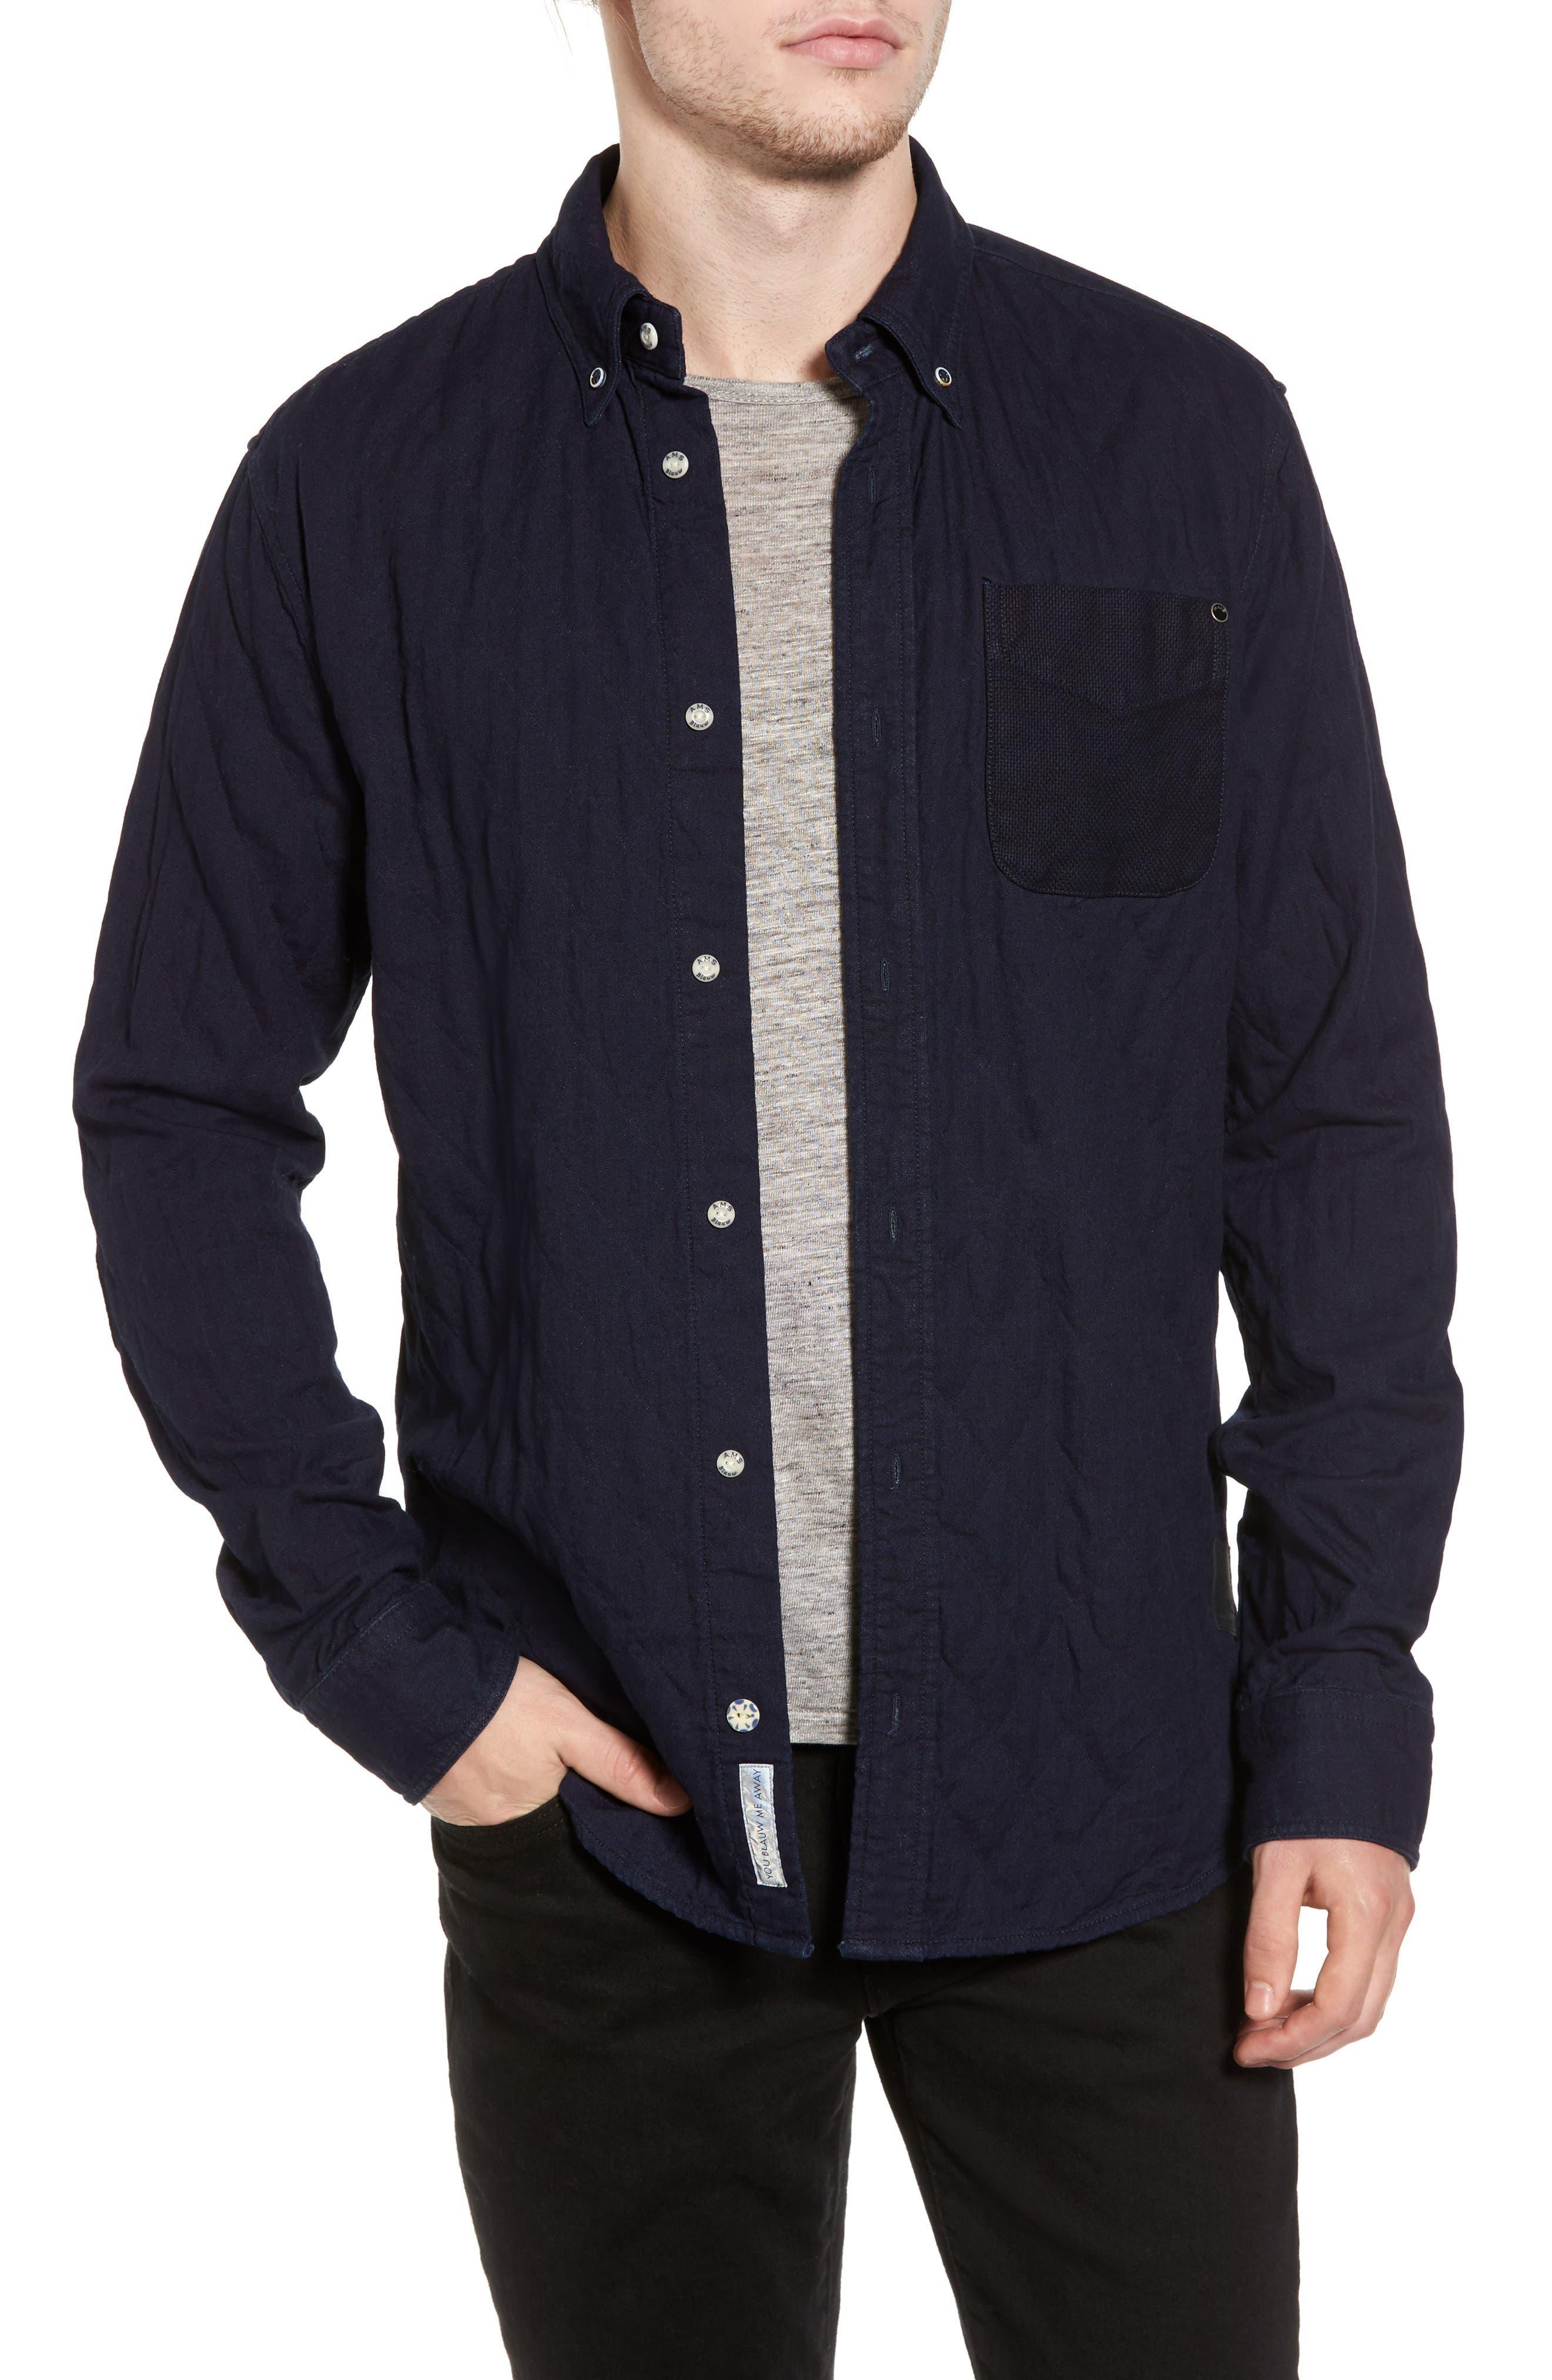 Main Image - Scotch & Soda Double Weave Overshirt